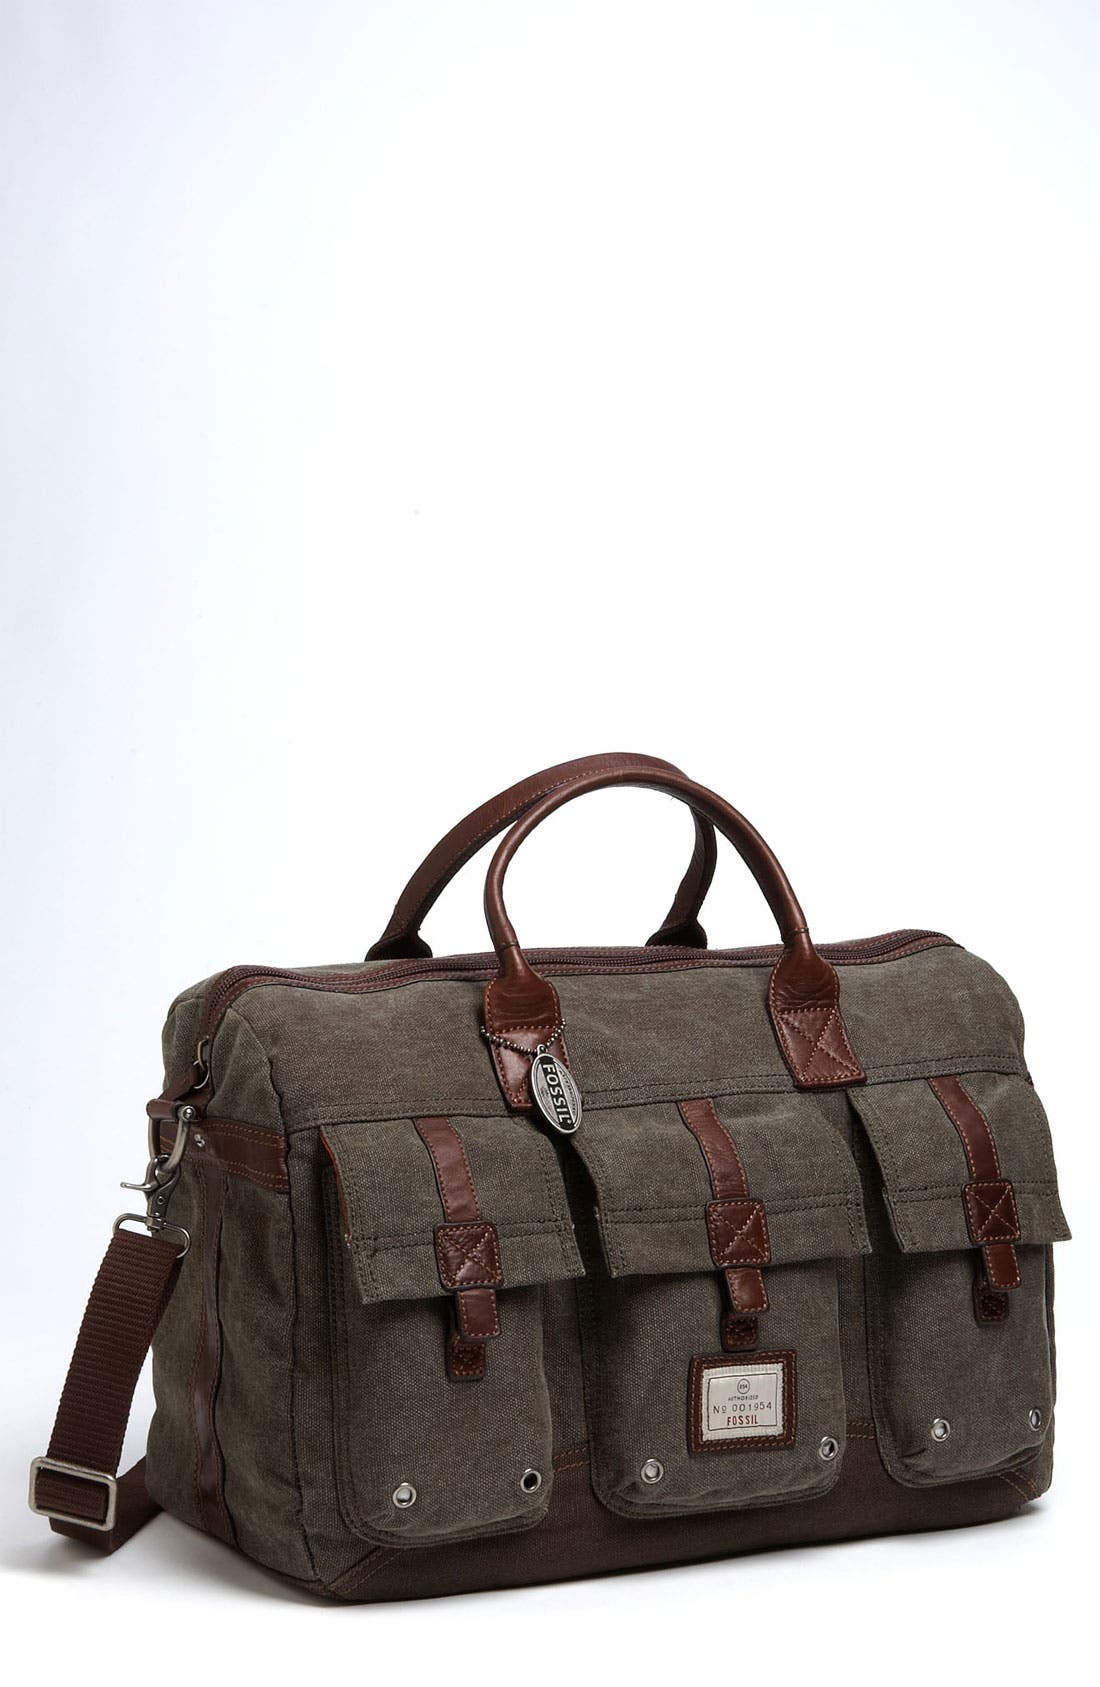 Alternate Image 1 Selected - Fossil 'Trail' Duffel Bag